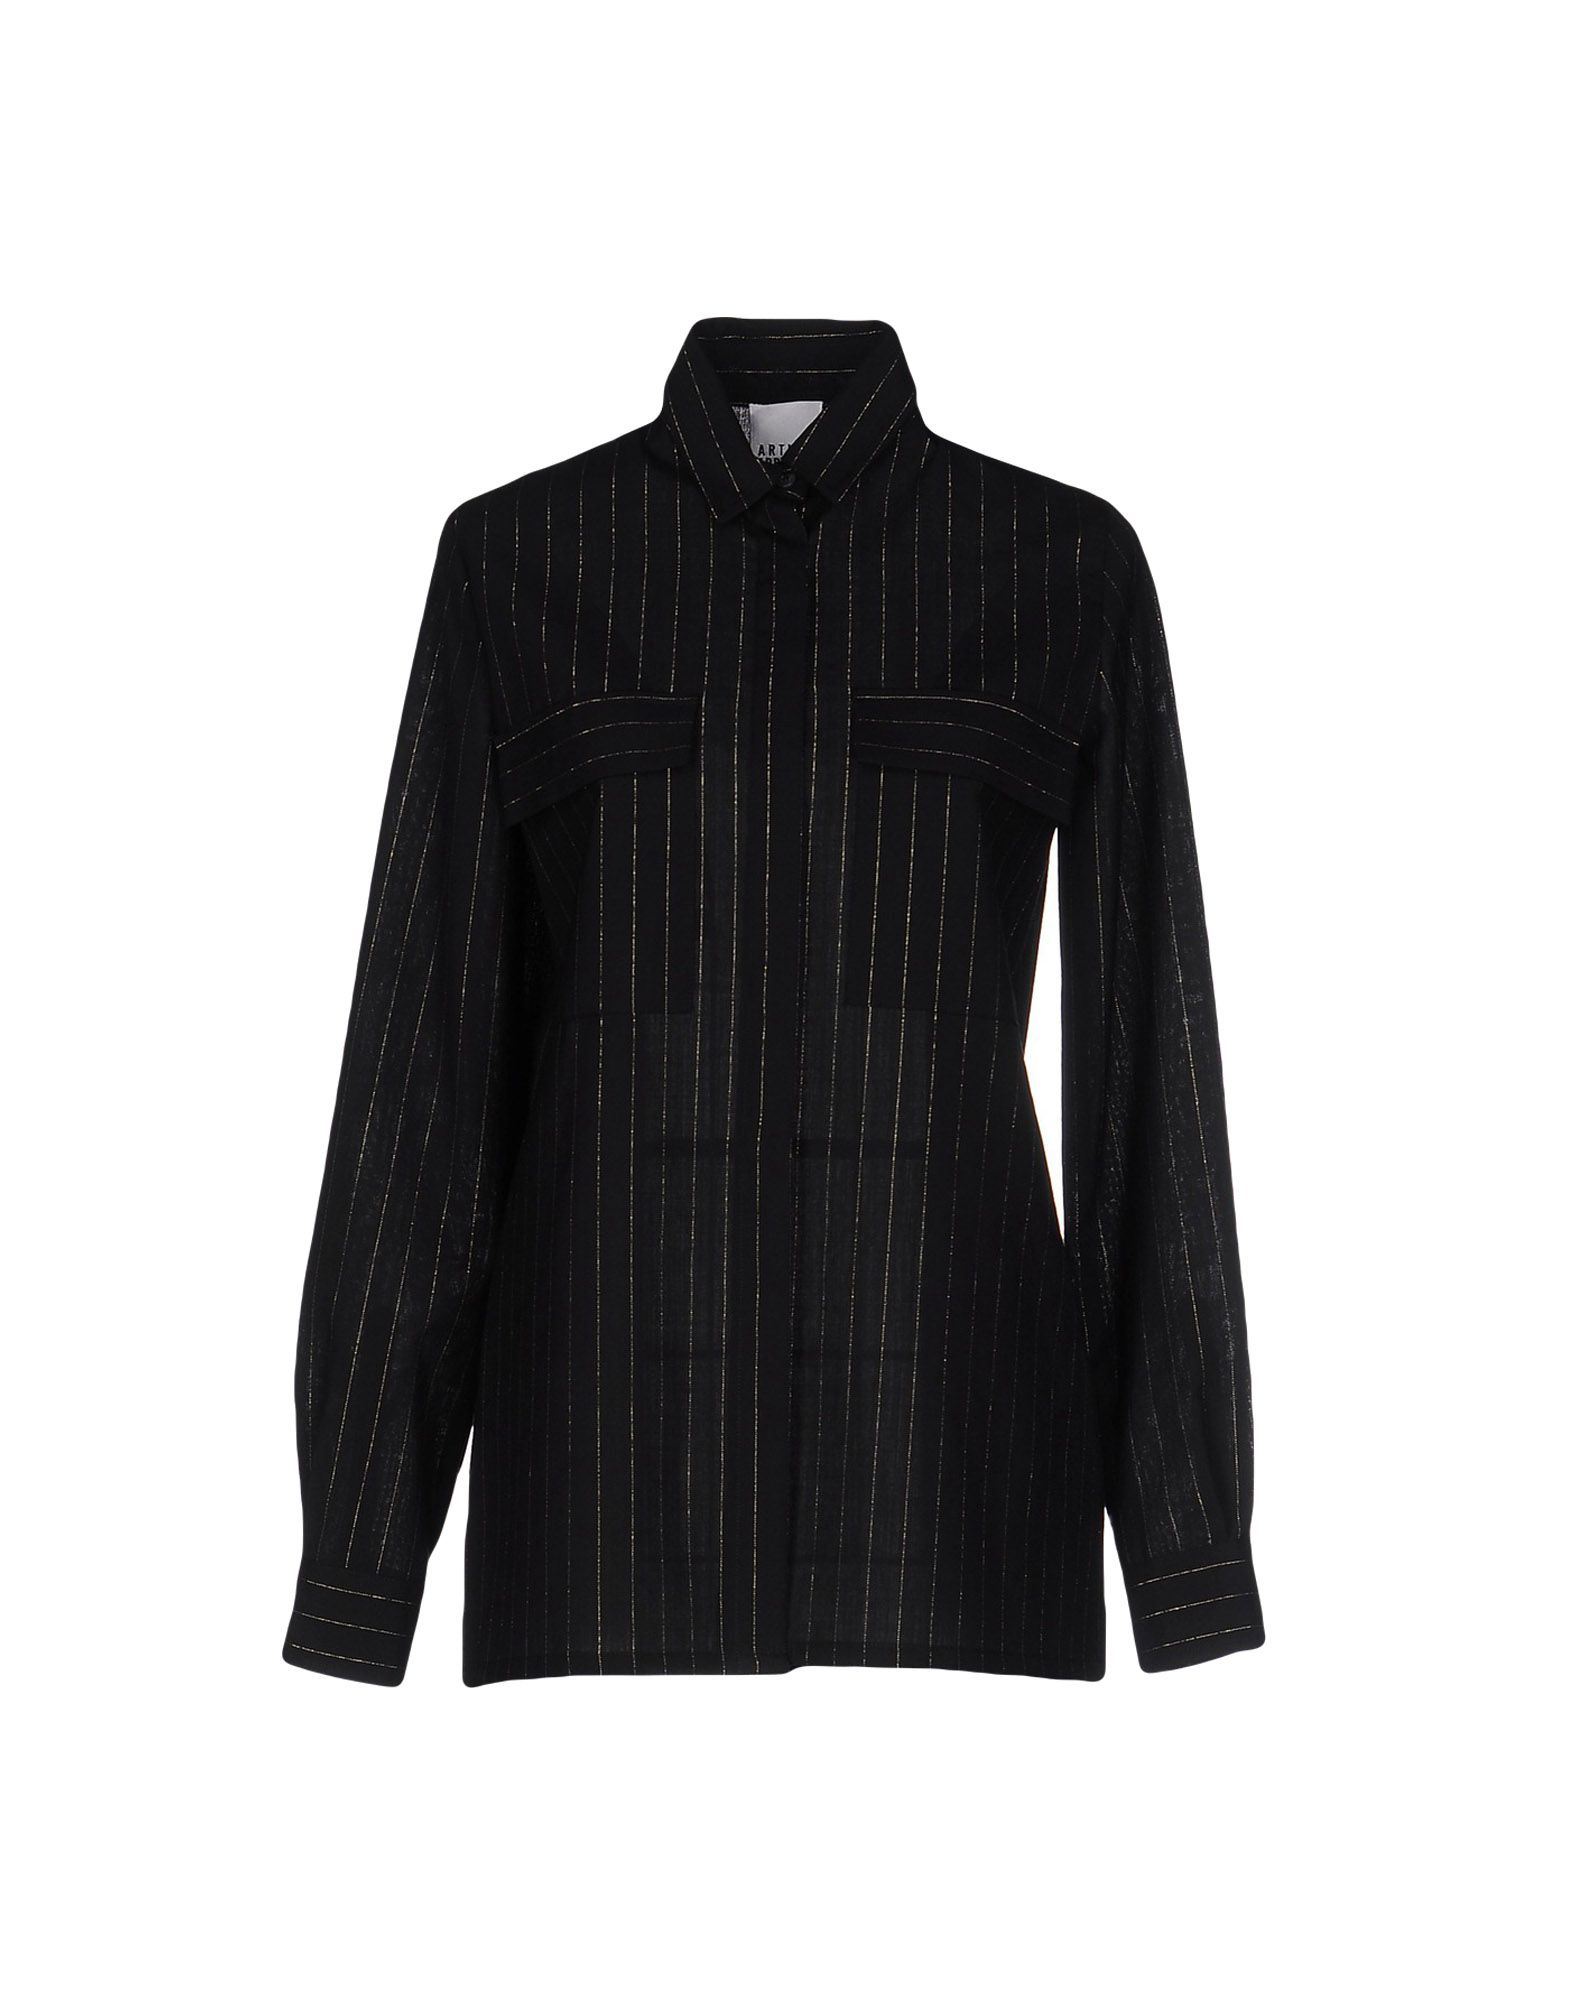 ARTHUR ARBESSER Striped Shirt in Black